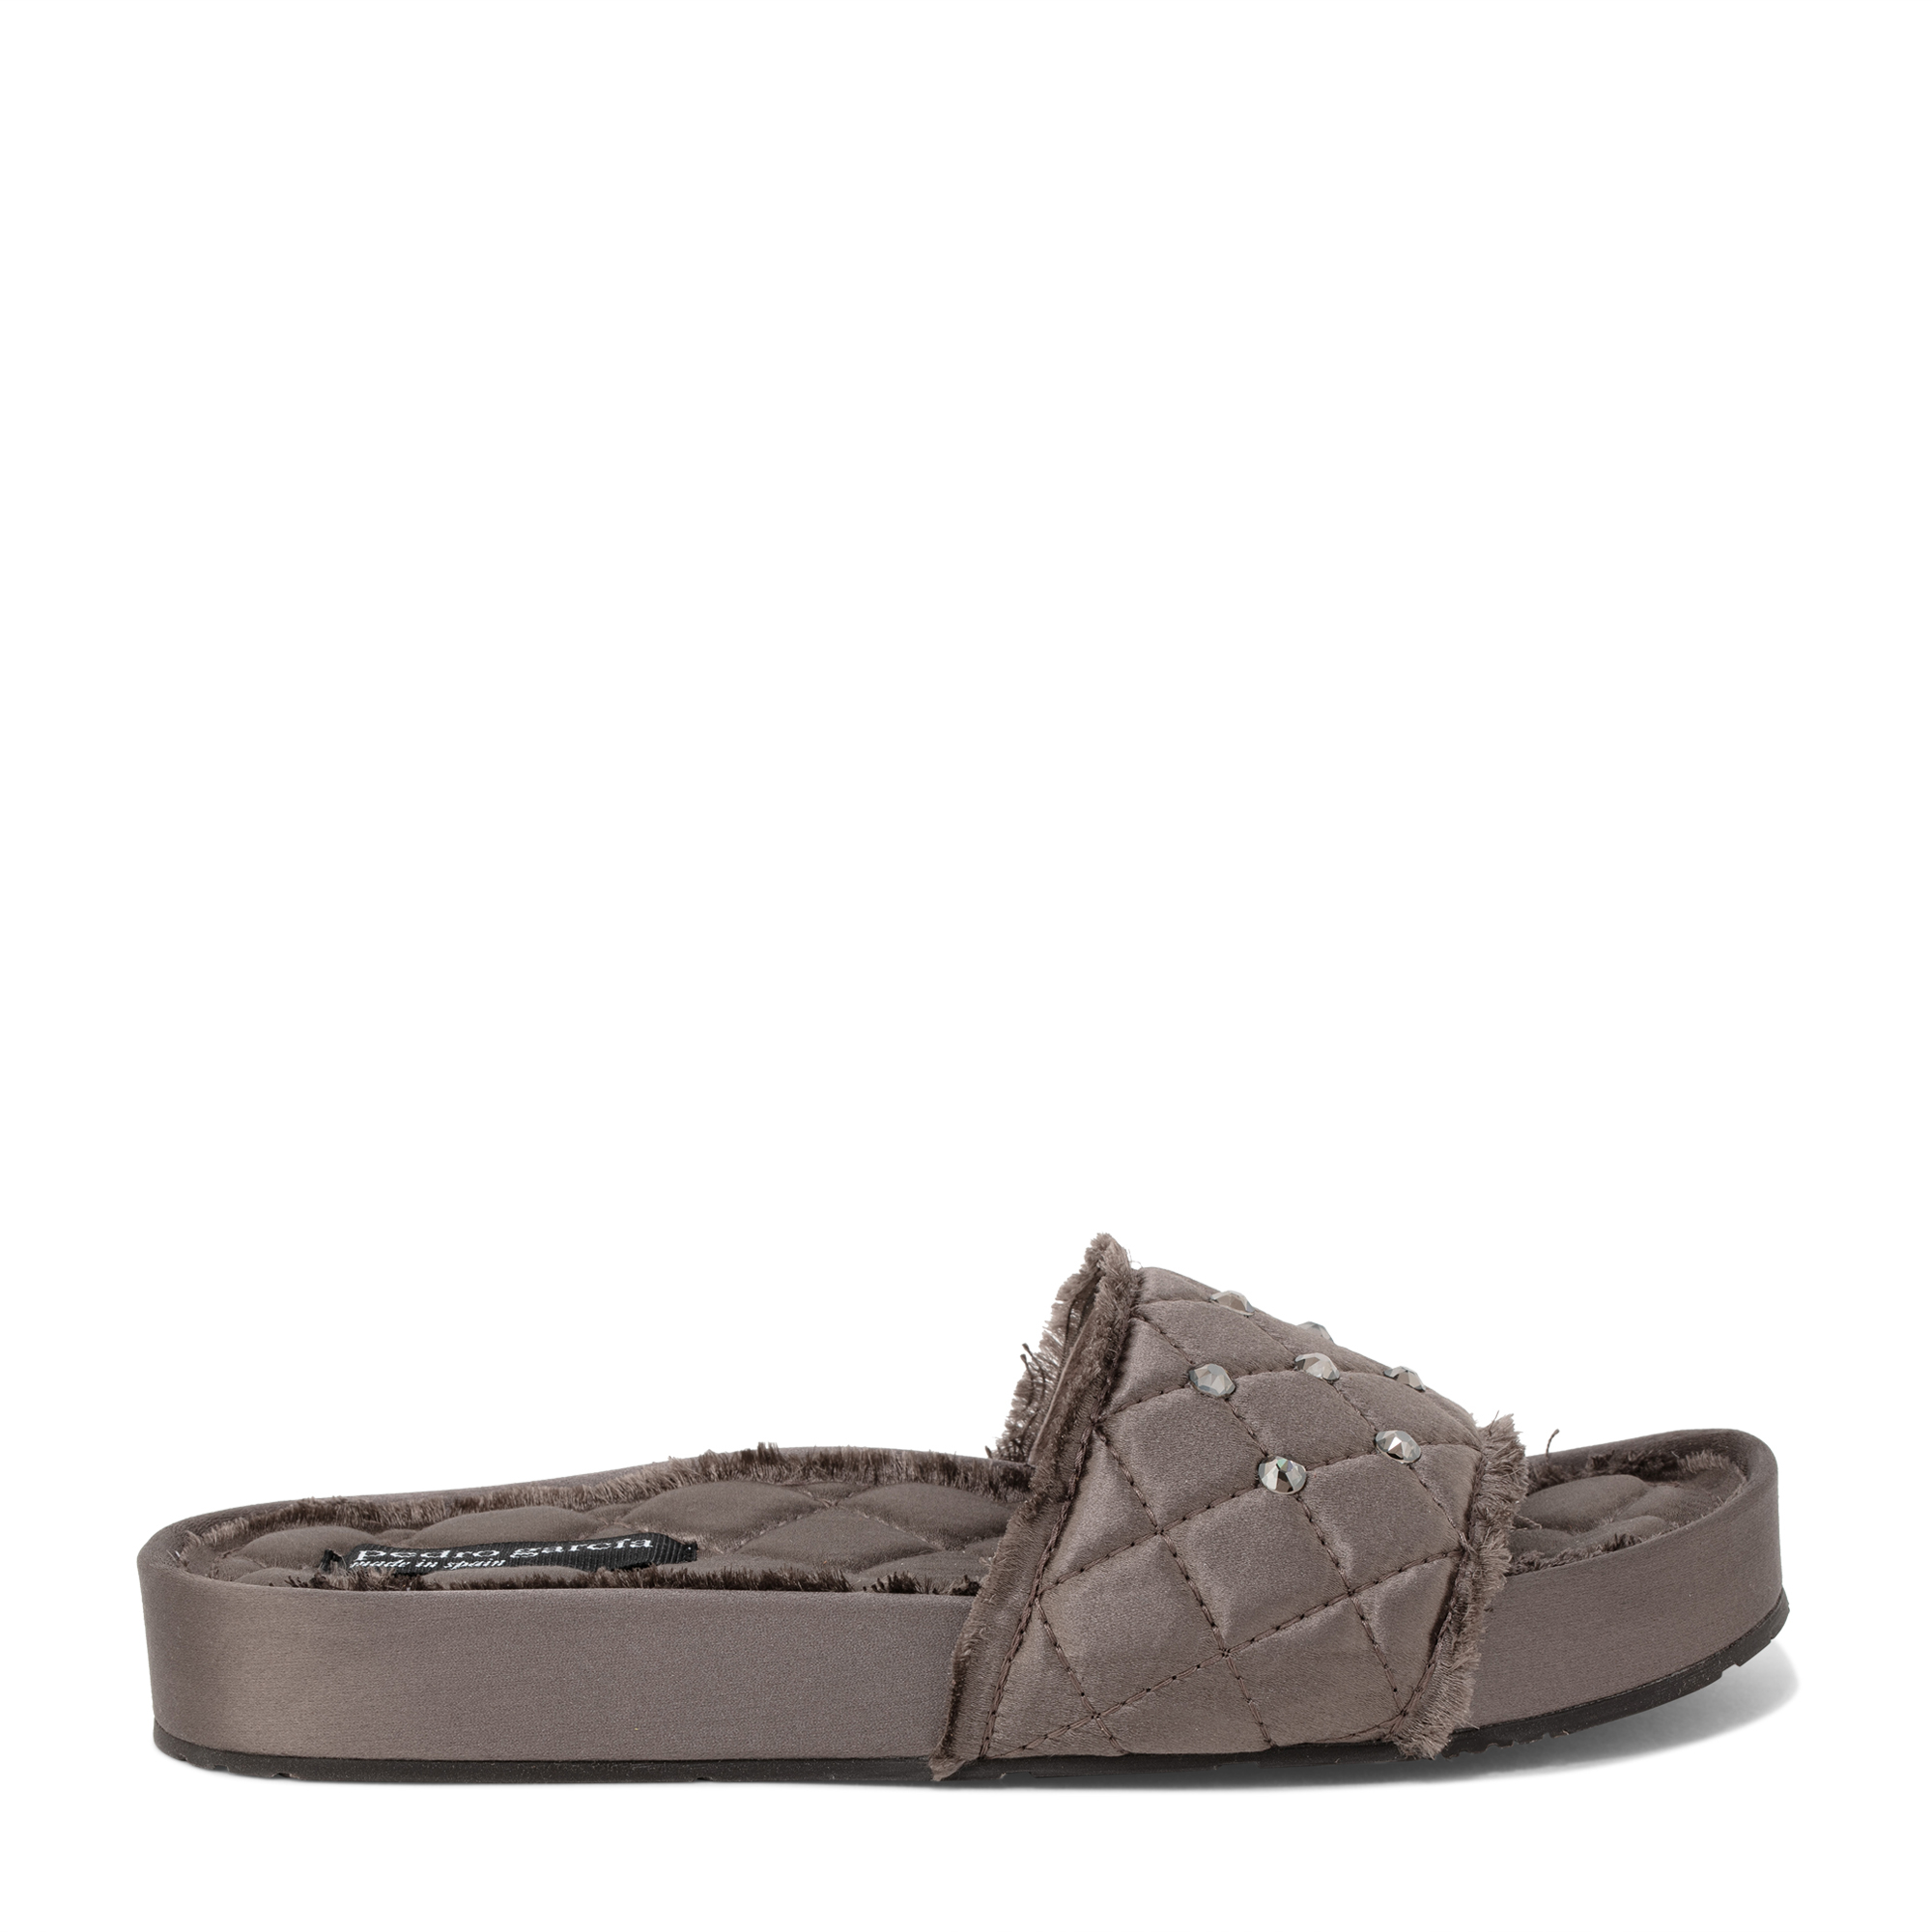 Aramis slide sandals